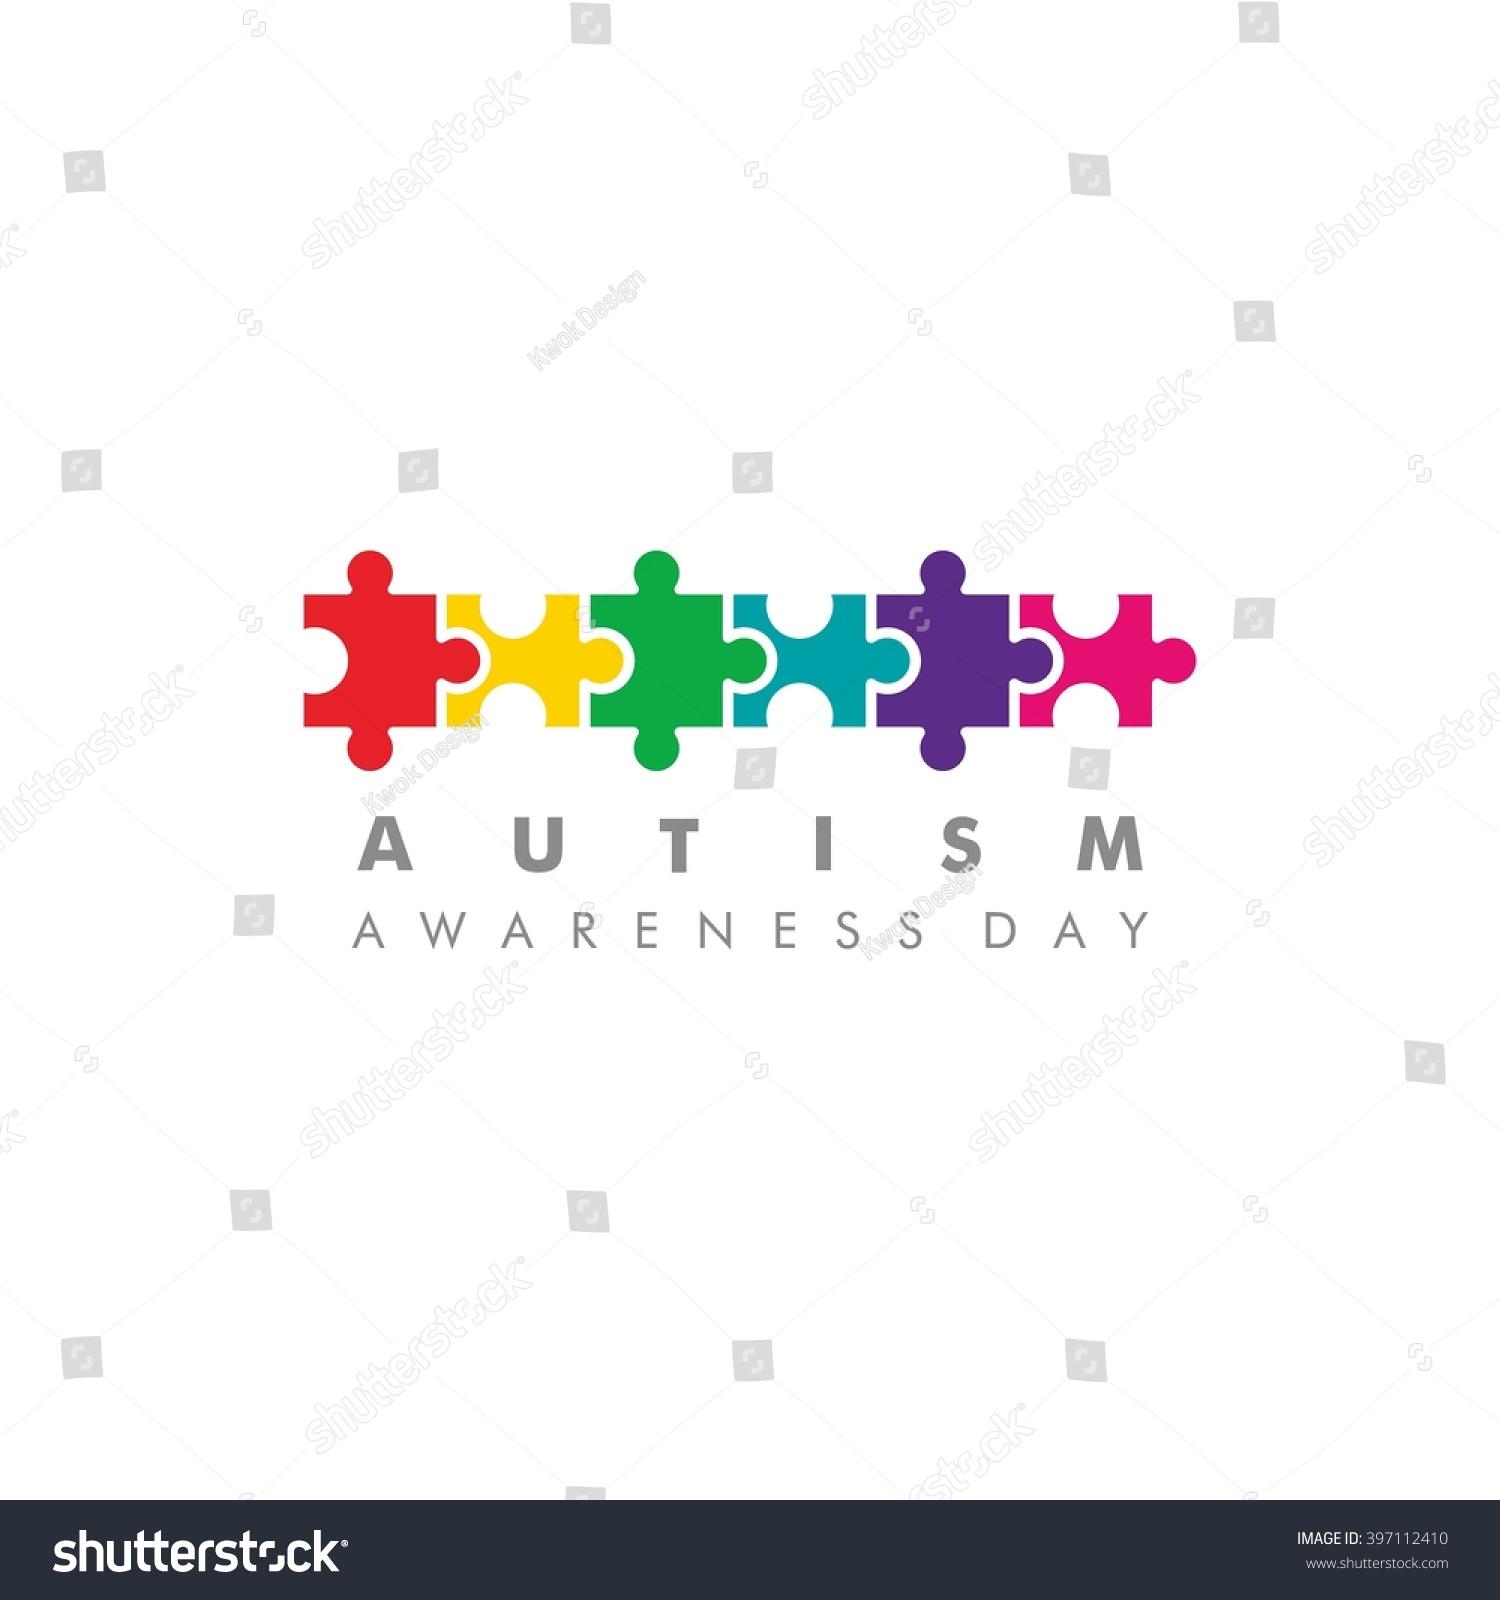 World autism awareness day logo design stock vector 397112410 world autism awareness day logo design template vector illustration colorful puzzles symbol biocorpaavc